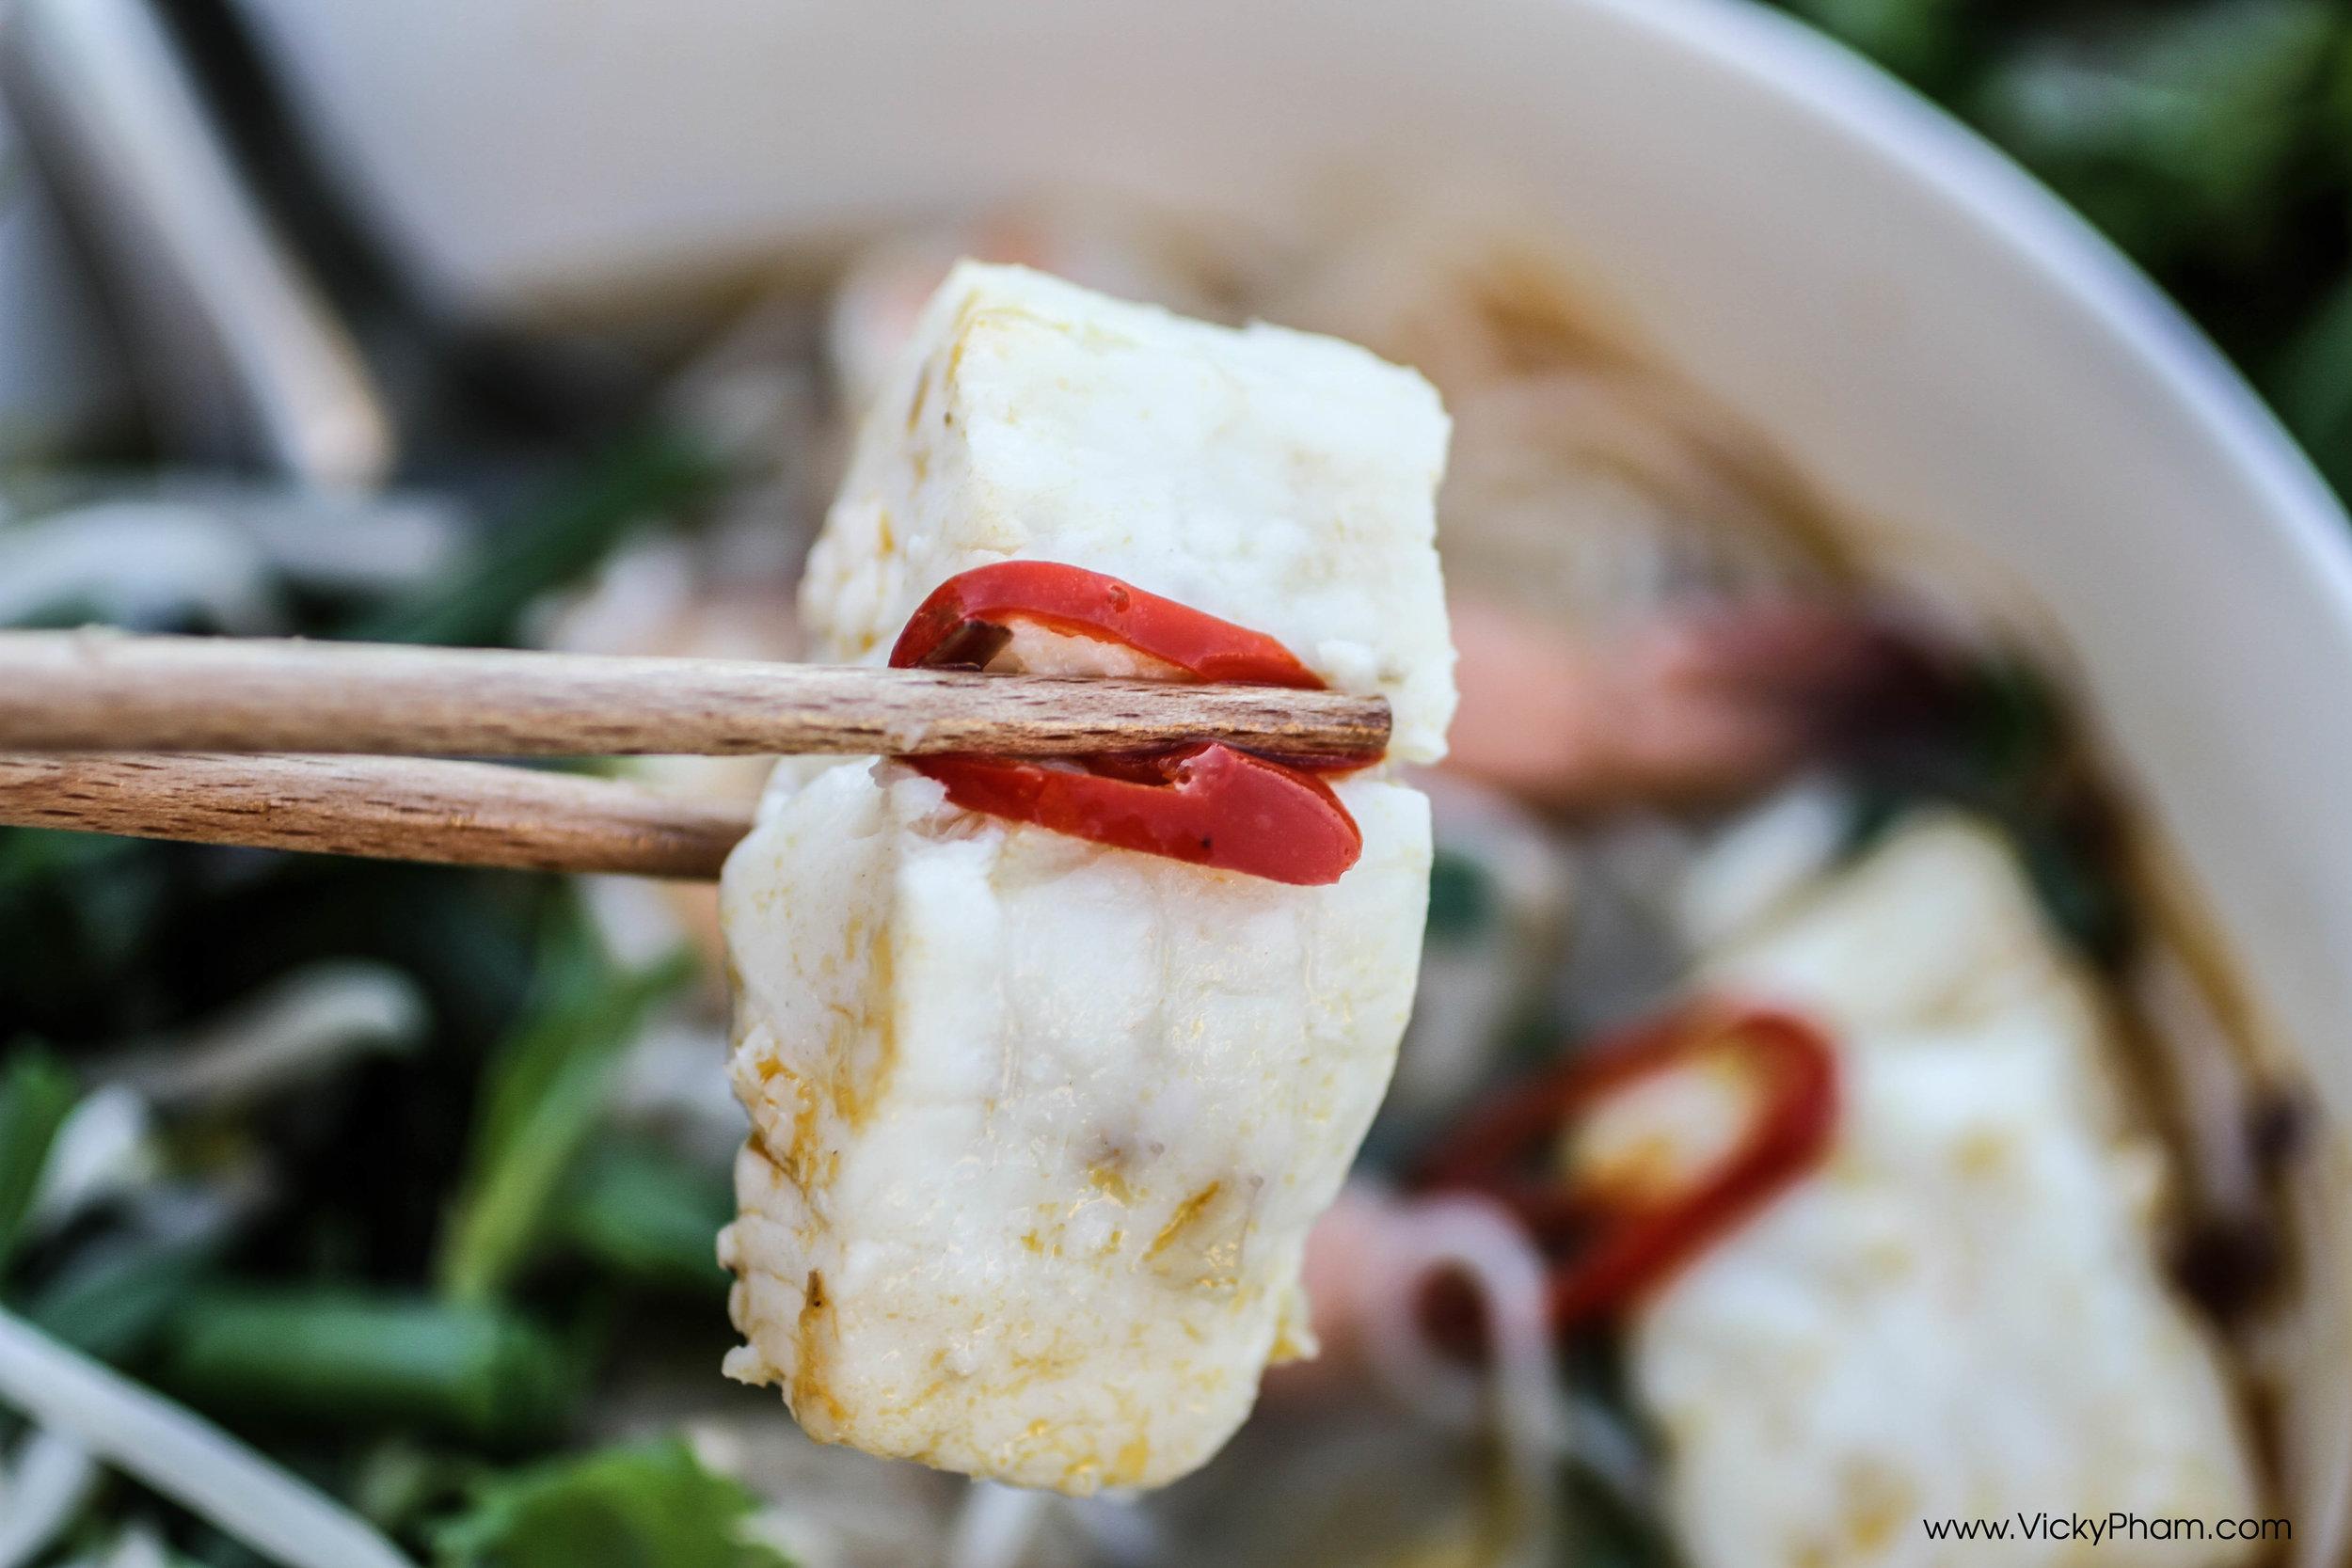 Vietnamese Fermented Fish & Seafood Vermicelli Soup Recipe (Bún Mắm)